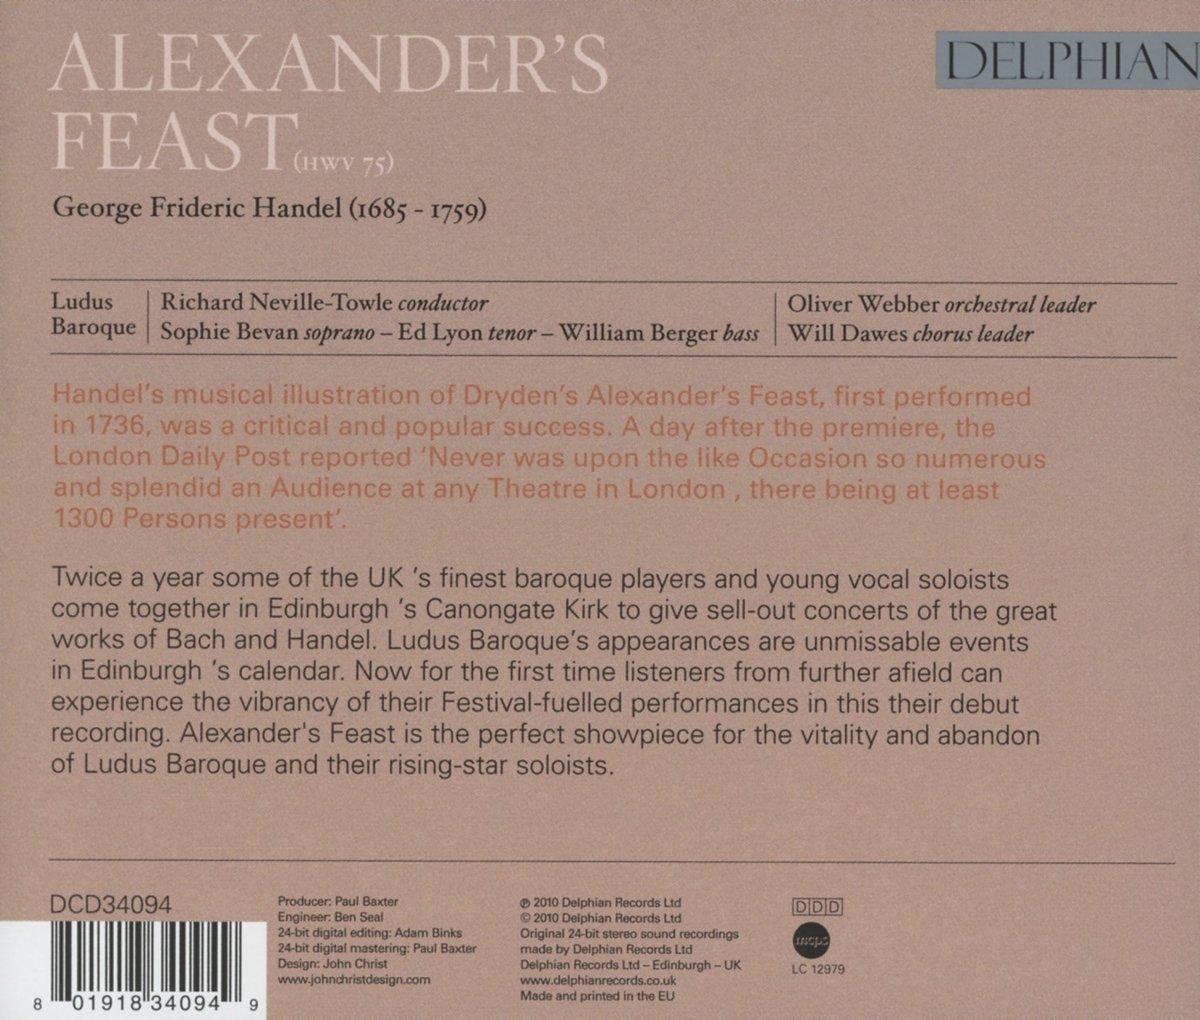 George Frideric Handel, Richard Neville-Towle, Ludus Baroque, Sophie Bevan, Ed Lyon, William Berger - Handel: Alexanders Feast - Amazon.com Music